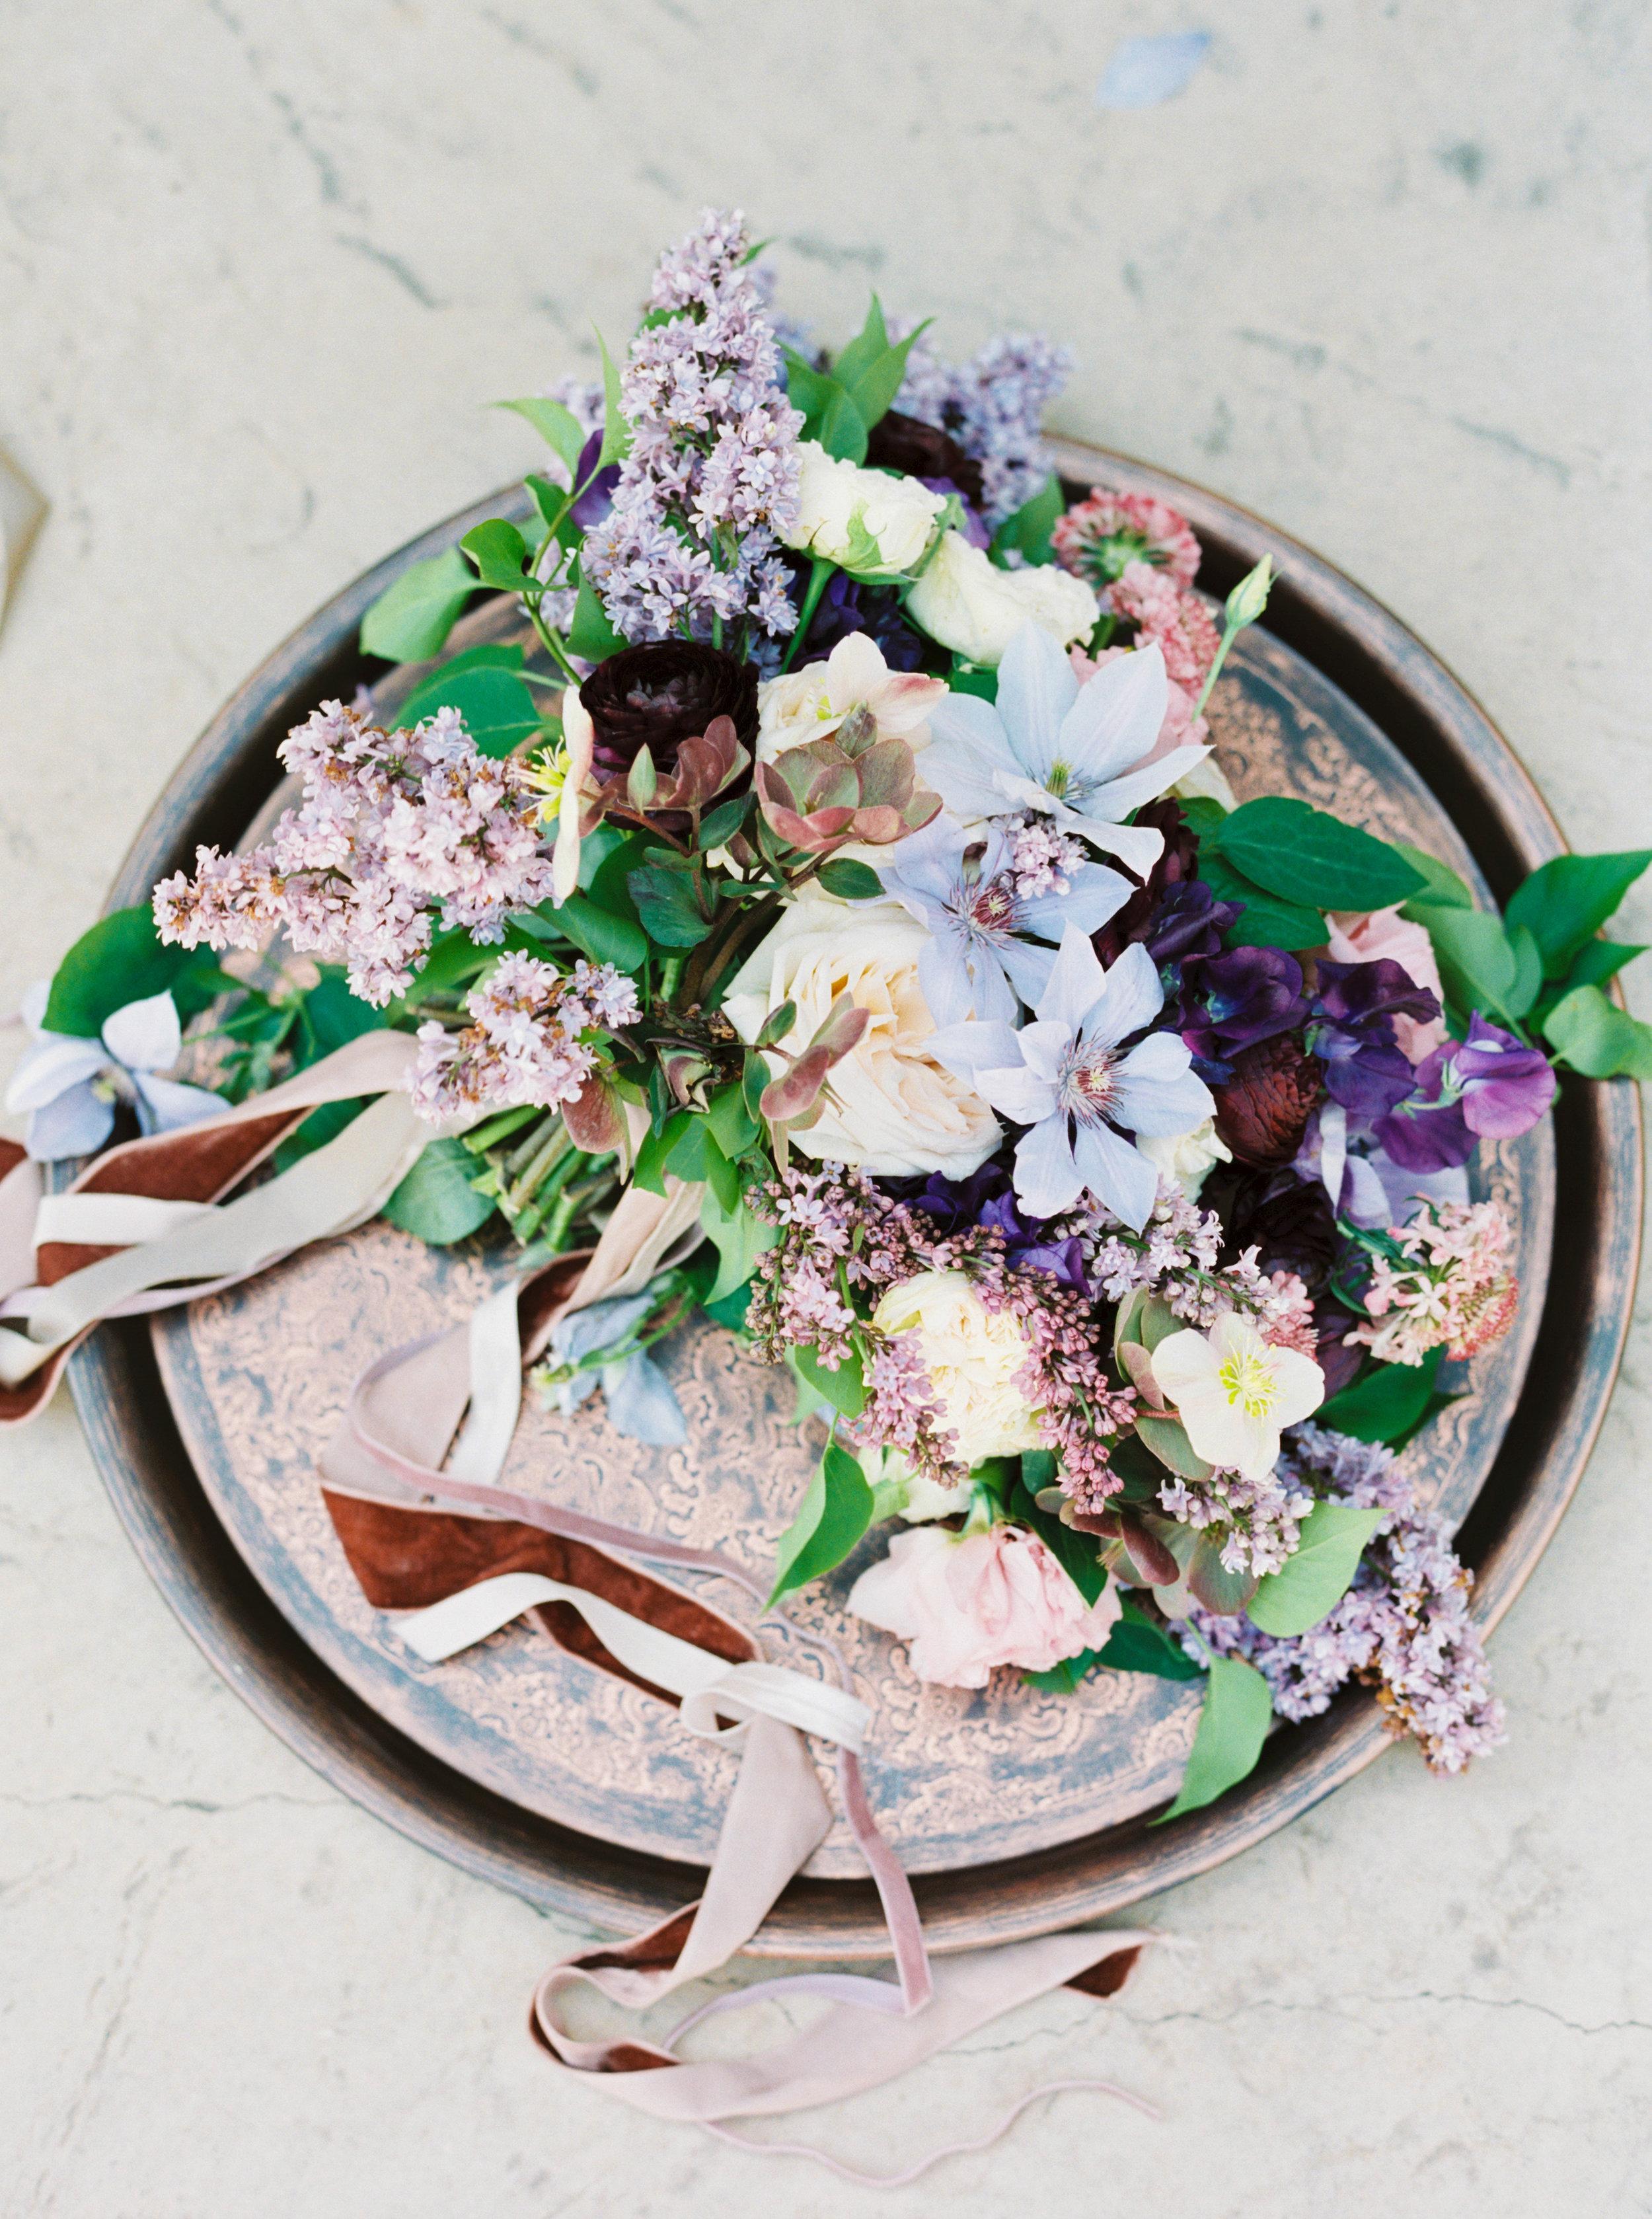 This-Love-of-Yours-Kirigin-Cellars-Flower-Arch-Styled-Shoot-037.jpg